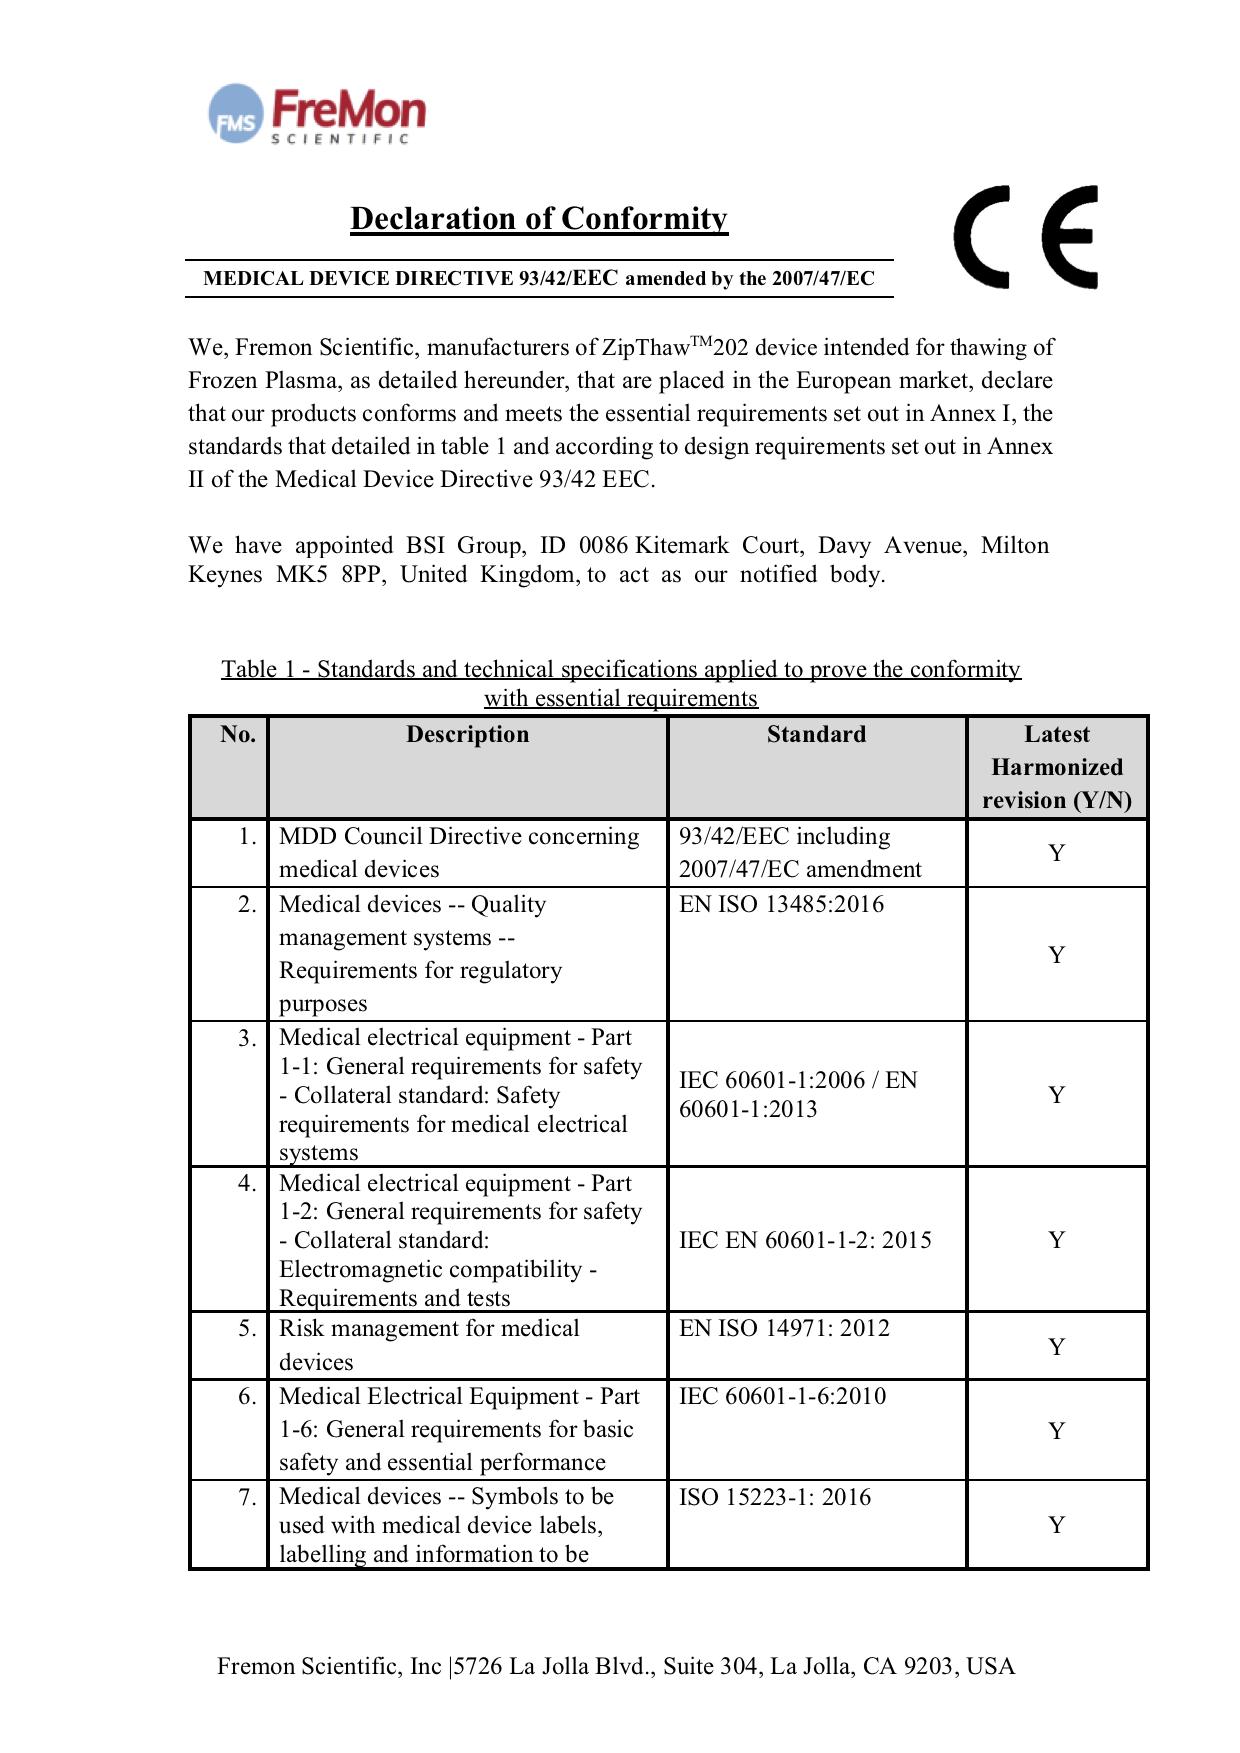 1ZipThawT 202 Declaration of Conformity valid until 27_05_2021